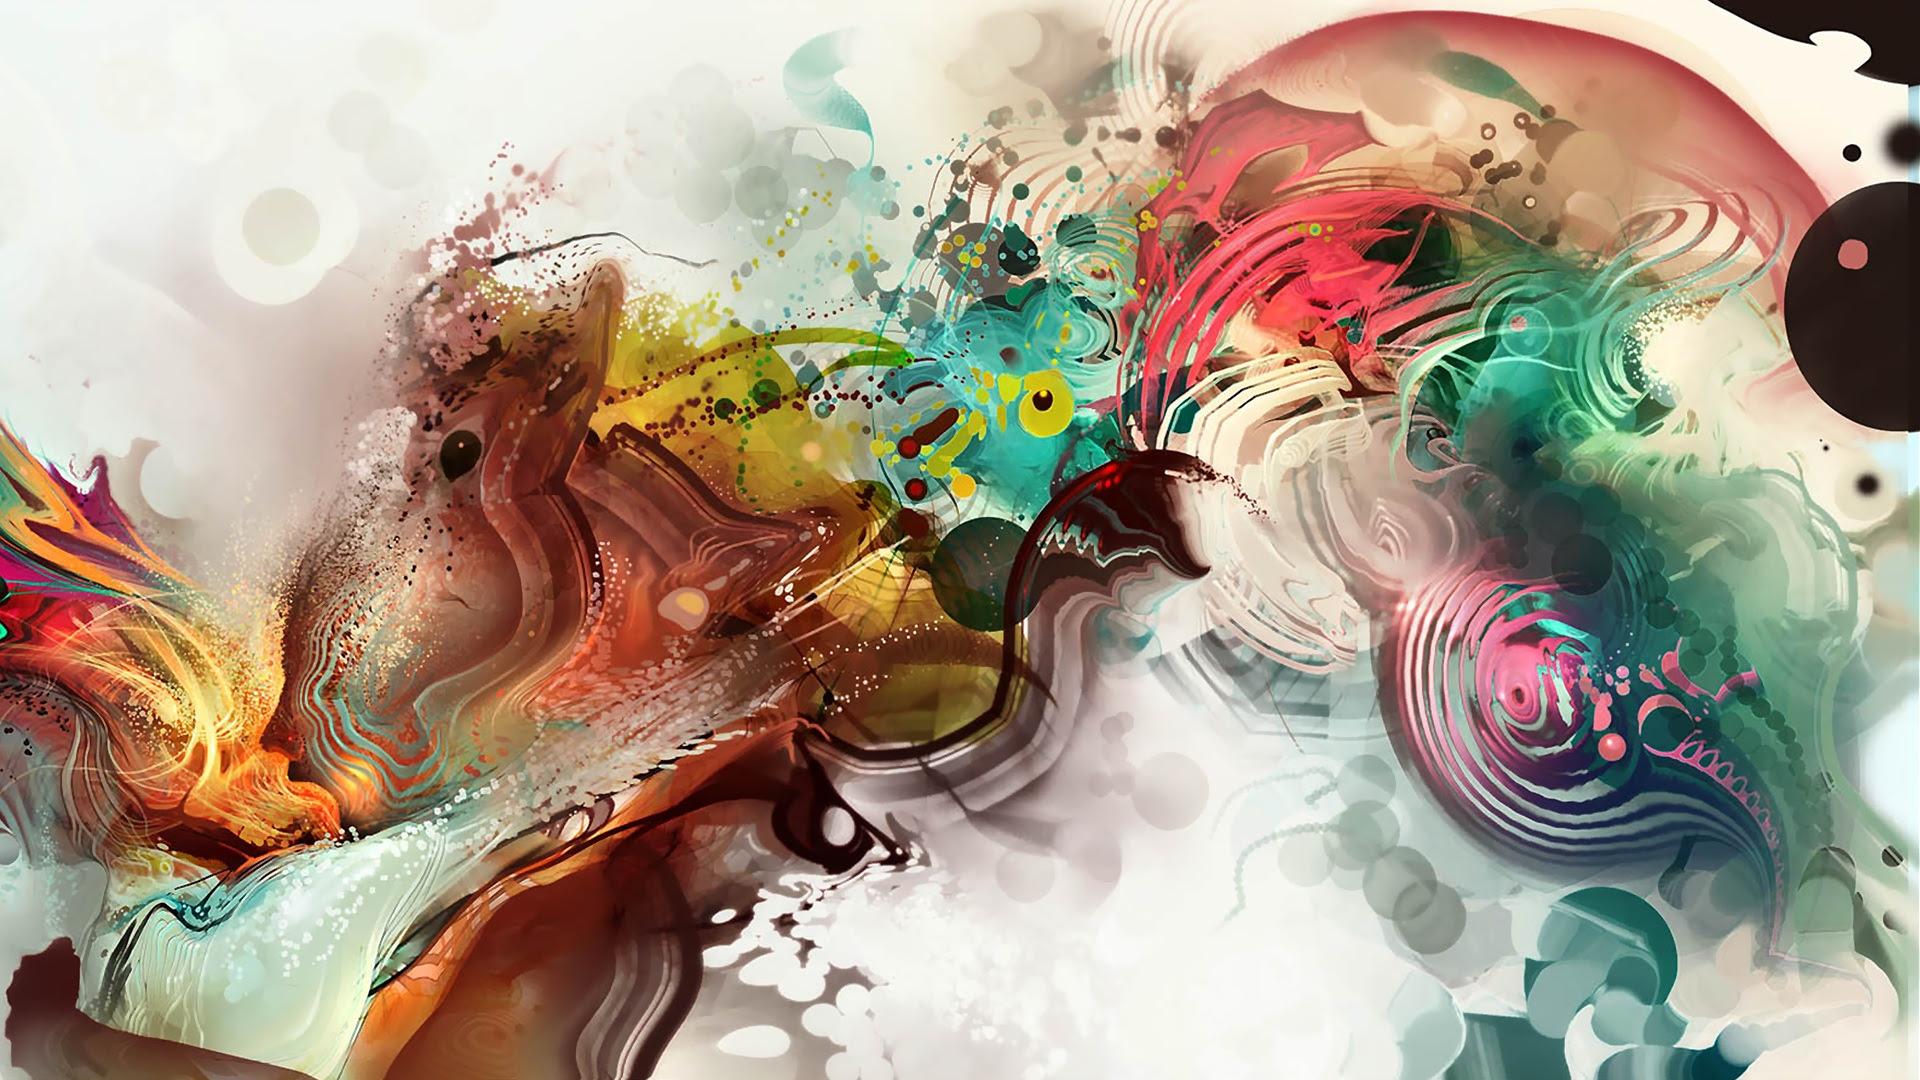 Artist Wallpaper Hd - Allwallpaper